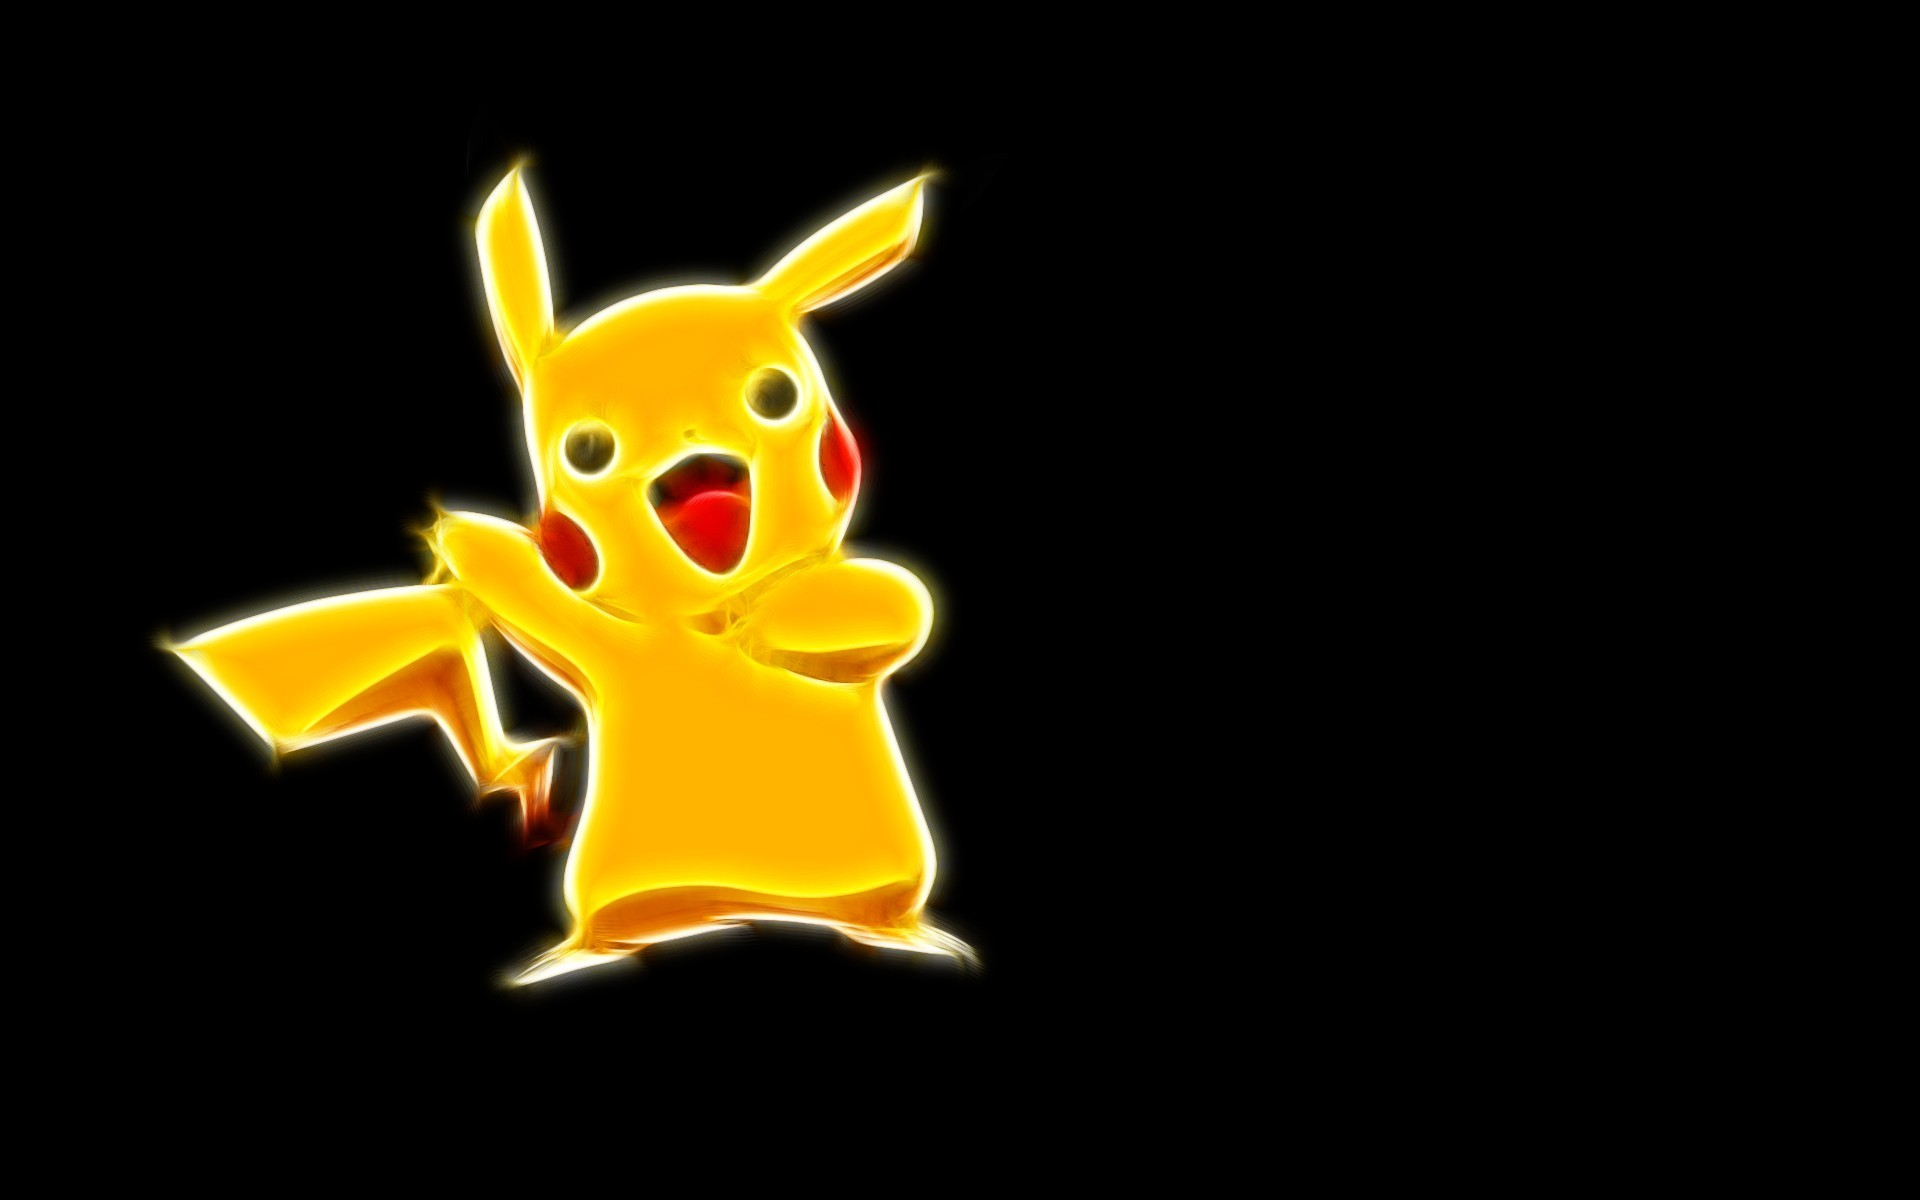 Mudkip Iphone Wallpaper Pikachu Wallpapers Hd Pixelstalk Net